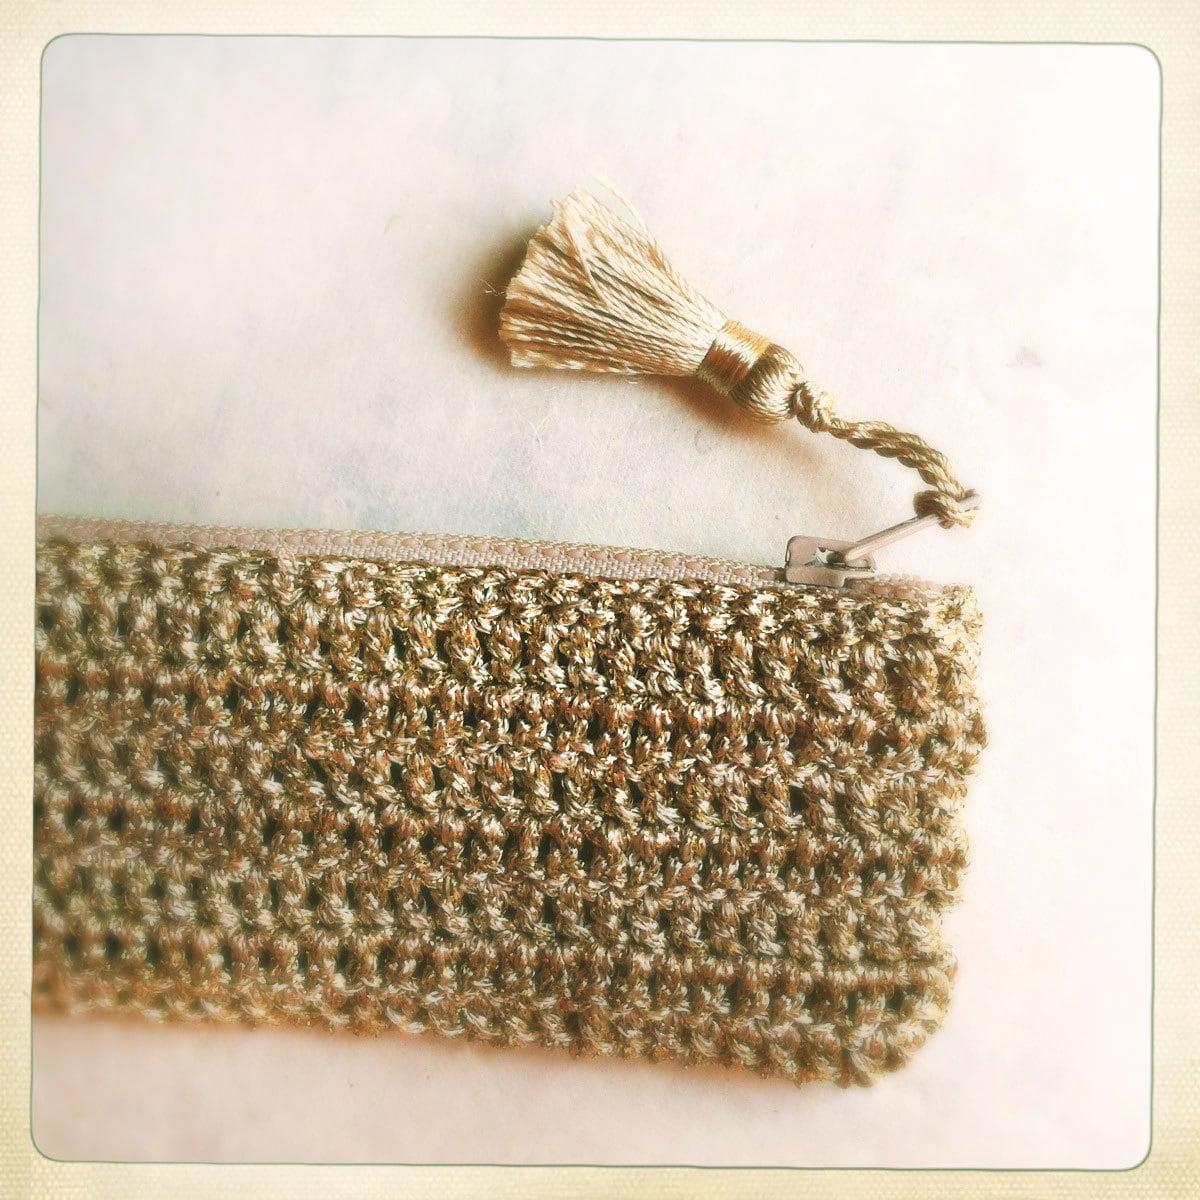 Golden Crochet Pencil Case